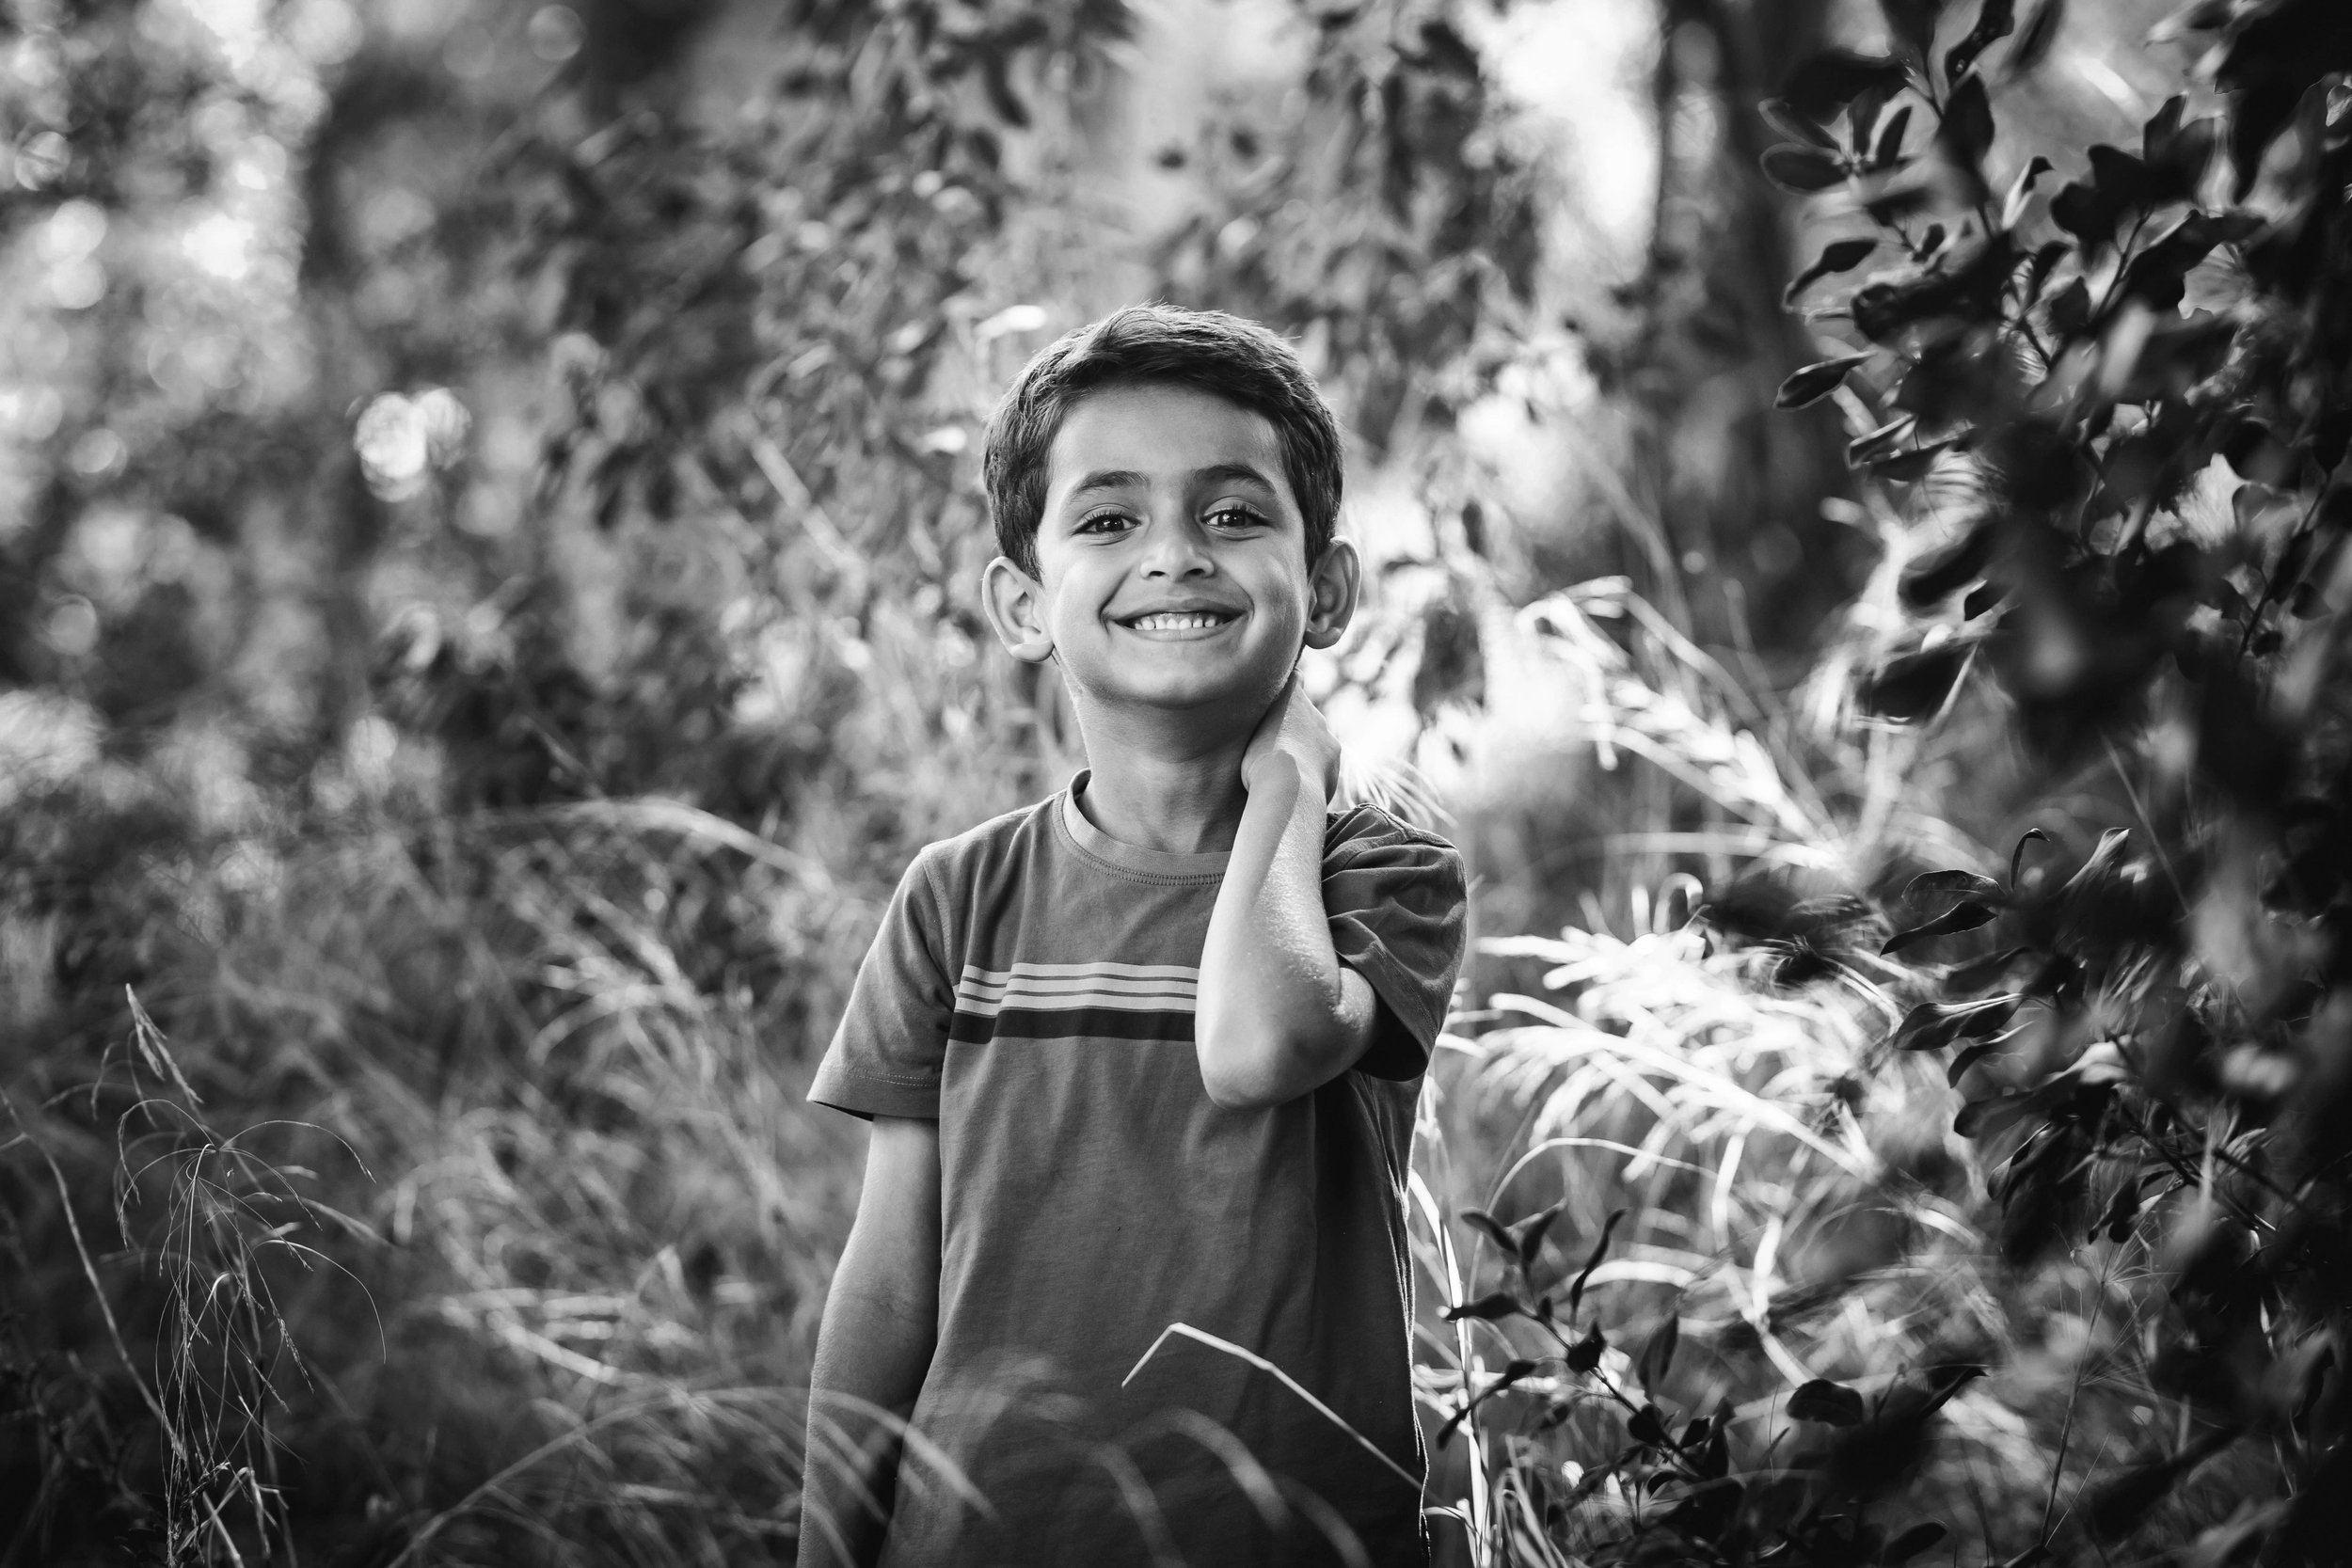 Portrait of a boy - Marbella, Spain